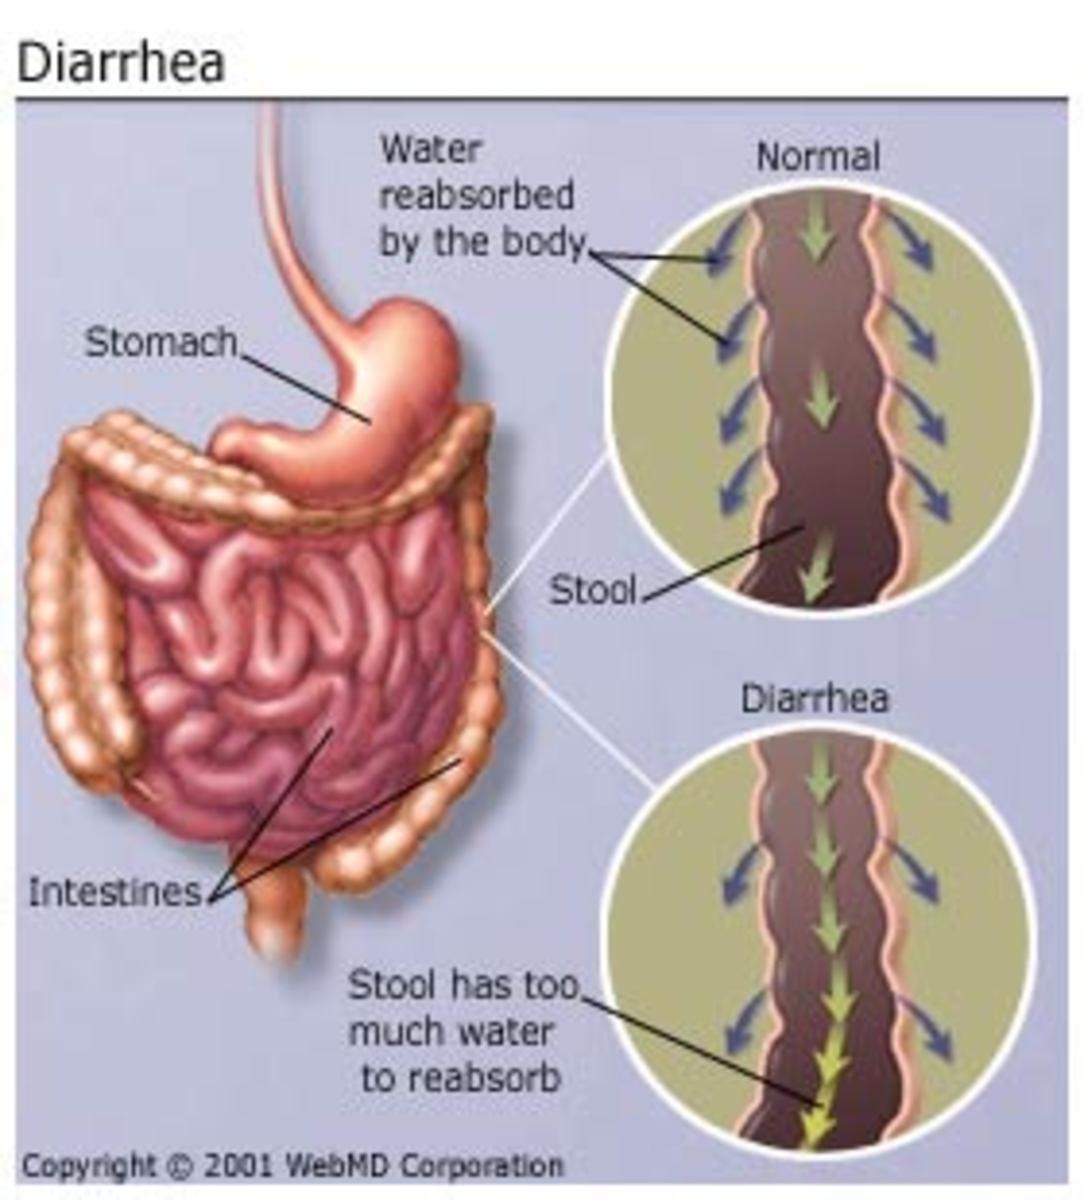 foods-to-avoid-while-having-diarrhea